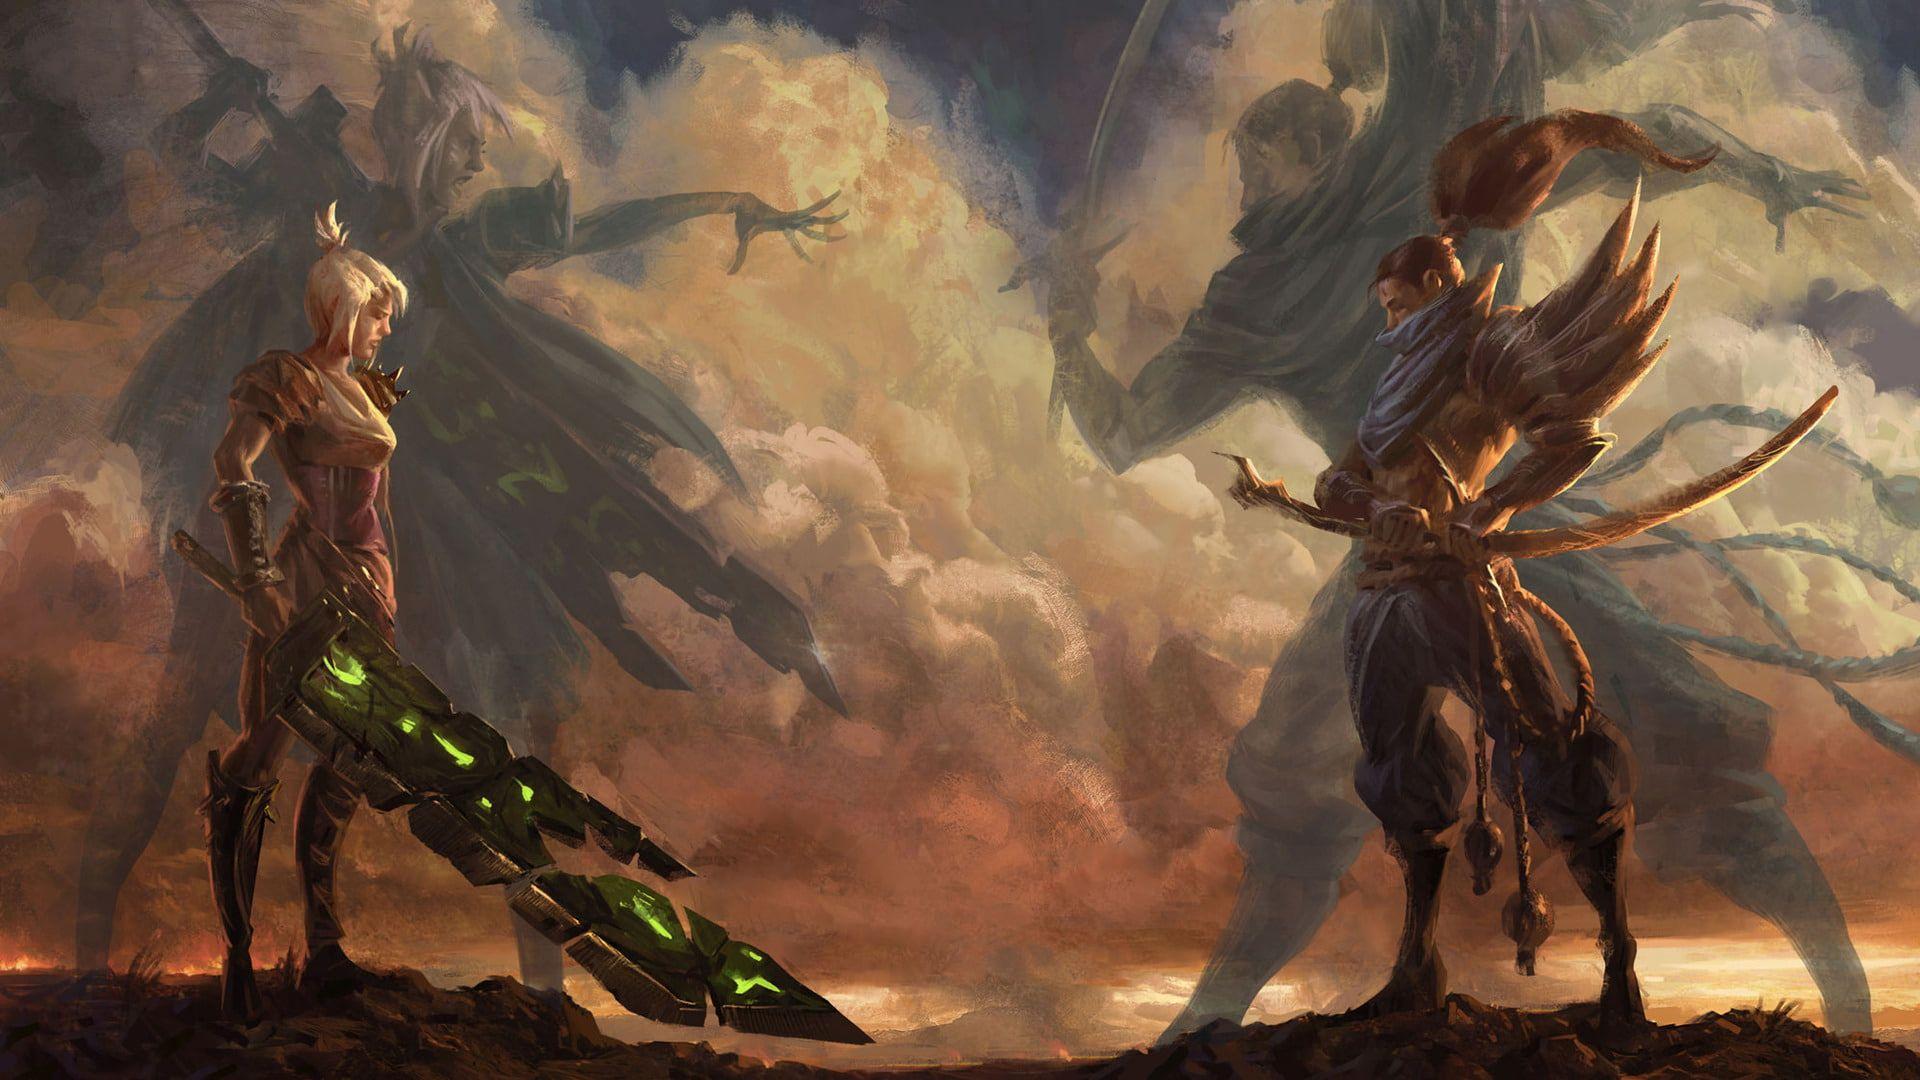 Video Game League Of Legends Riven League Of Legends Yasuo League Of Legends 1080p Wallpaper Hdwallpaper Zed Wallpaper Figura Desenho Witcher Wallpaper